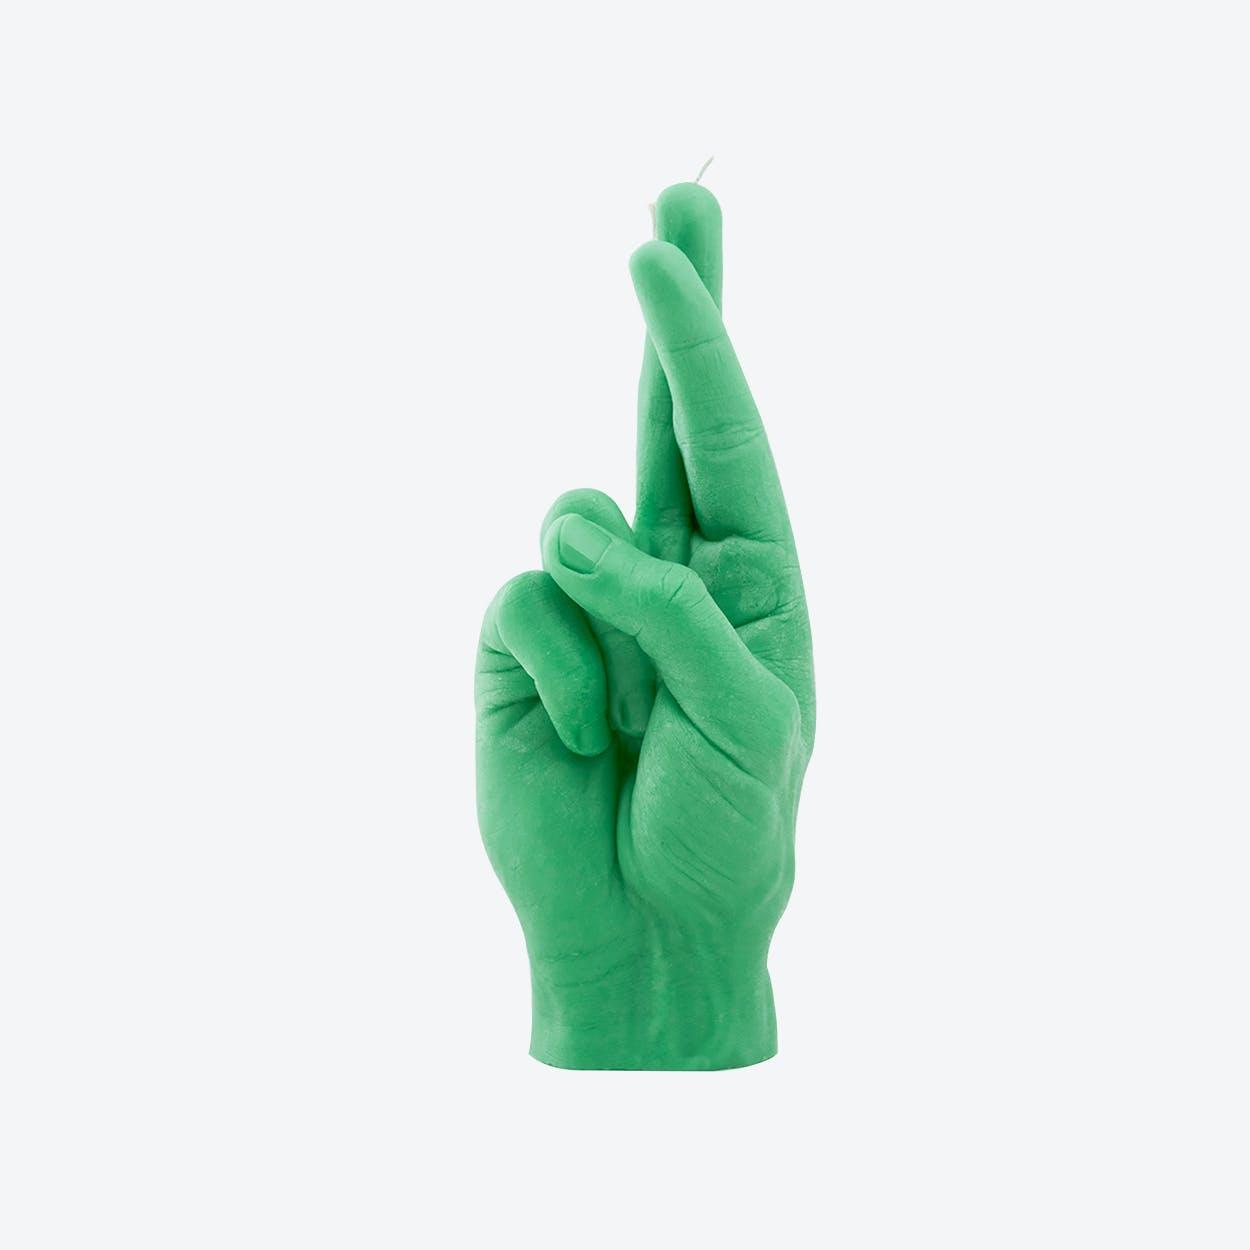 """CrossedFingers"" Hand Gesture Candle in Green"